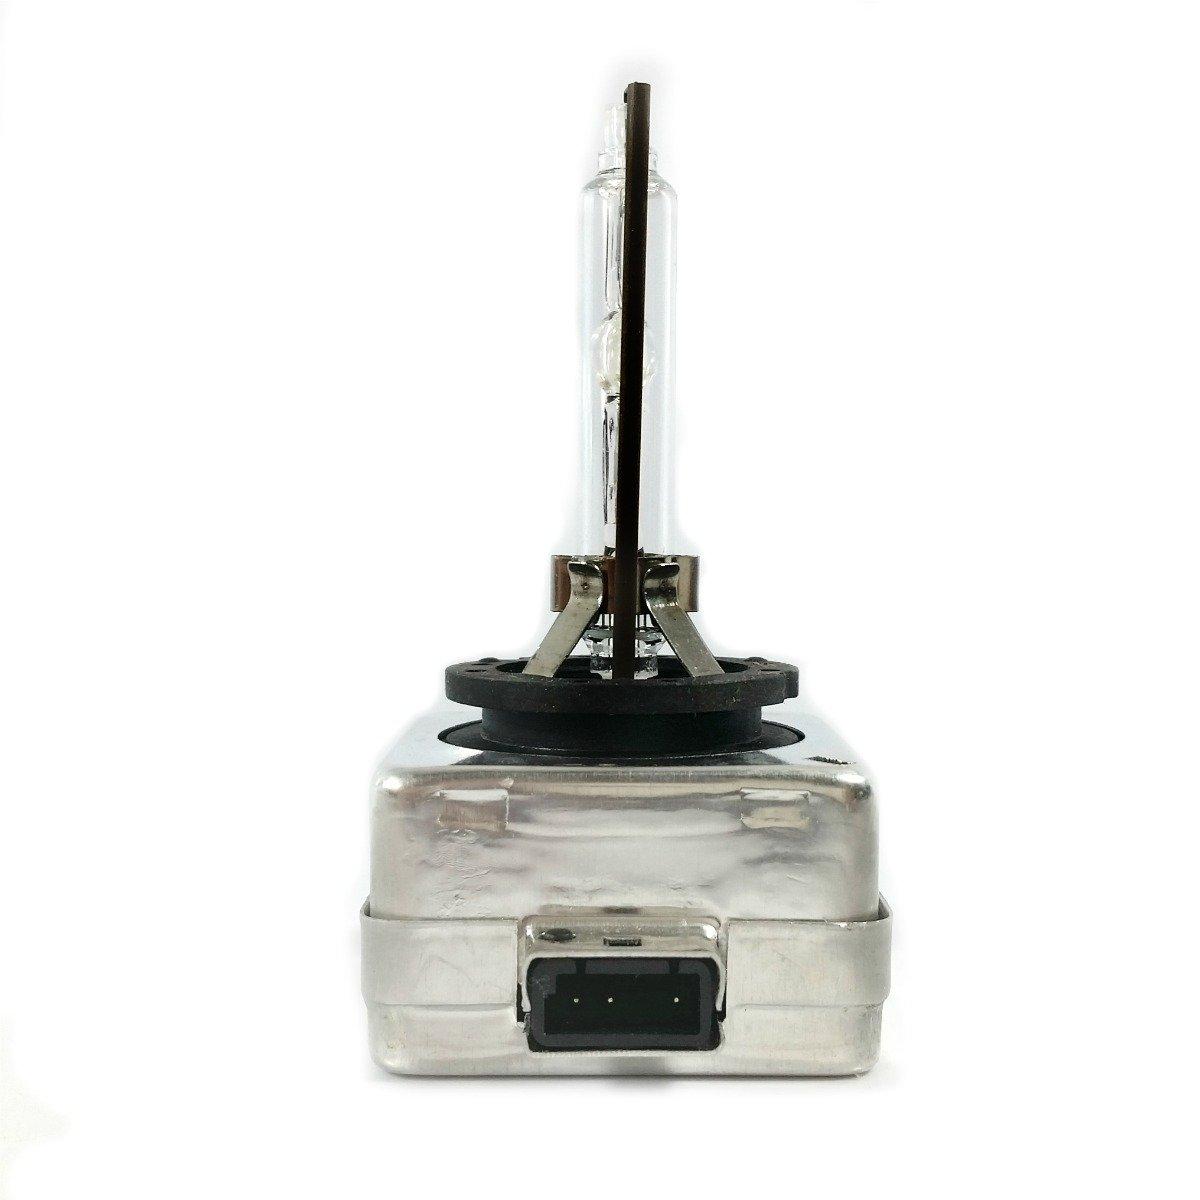 D1S W//Starter, 5000K For L26-0087 Kaper II L05-0002 HID Bulb